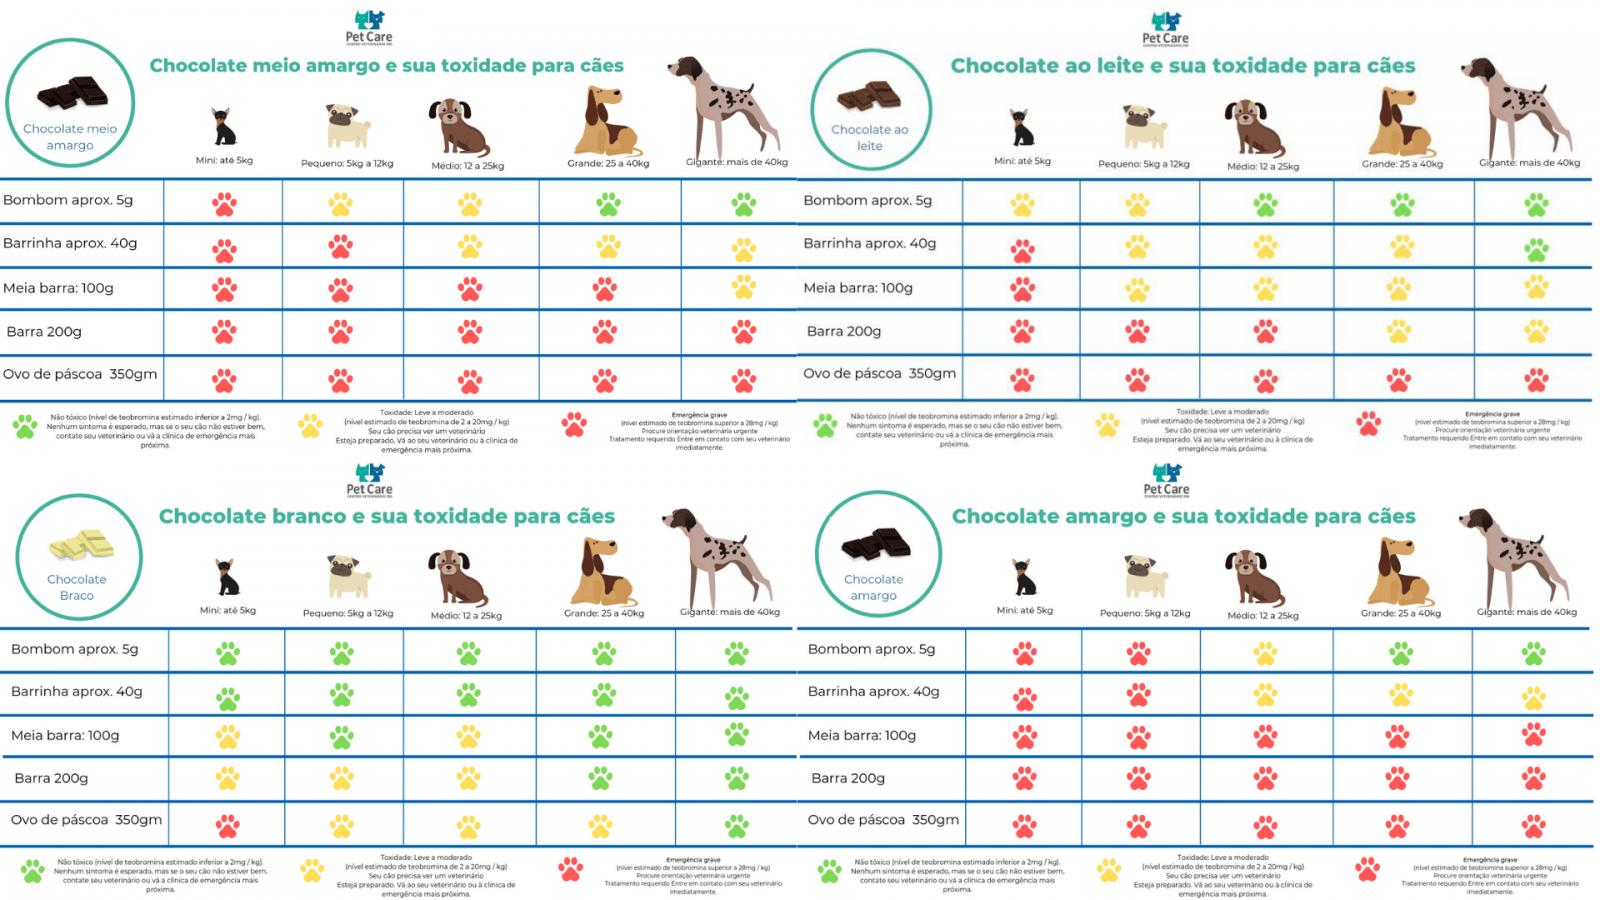 tabela de toxidade de chocolate para caes - Tabela de toxidade de chocolate para cachorro